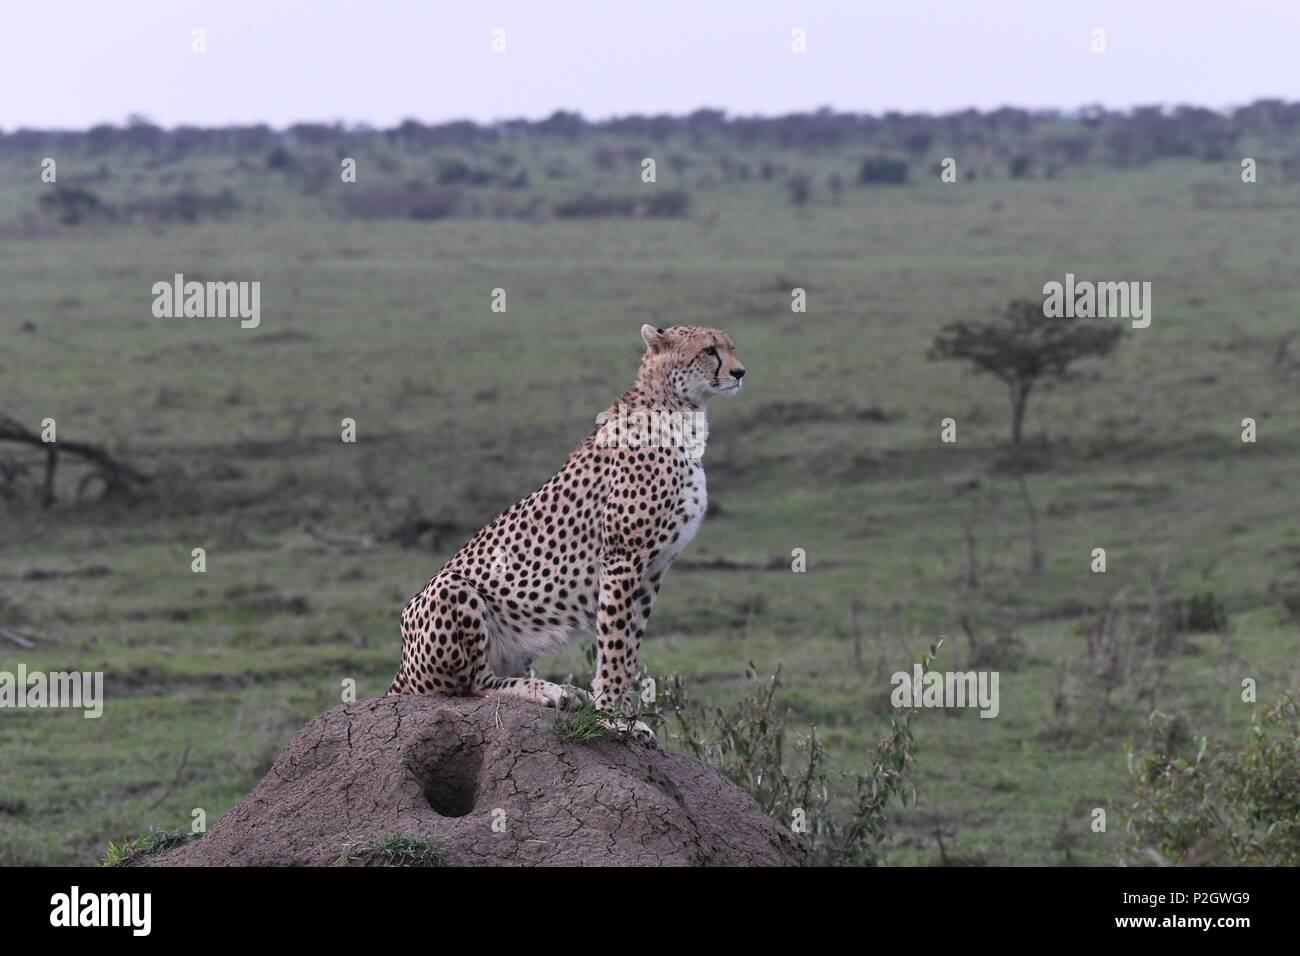 Lone cheetah sitting on the green Maasai Mara savannah looking for prey. Picture taken early morning, Olare Motorogi Conservancy. Acinonyx jubatus - Stock Image